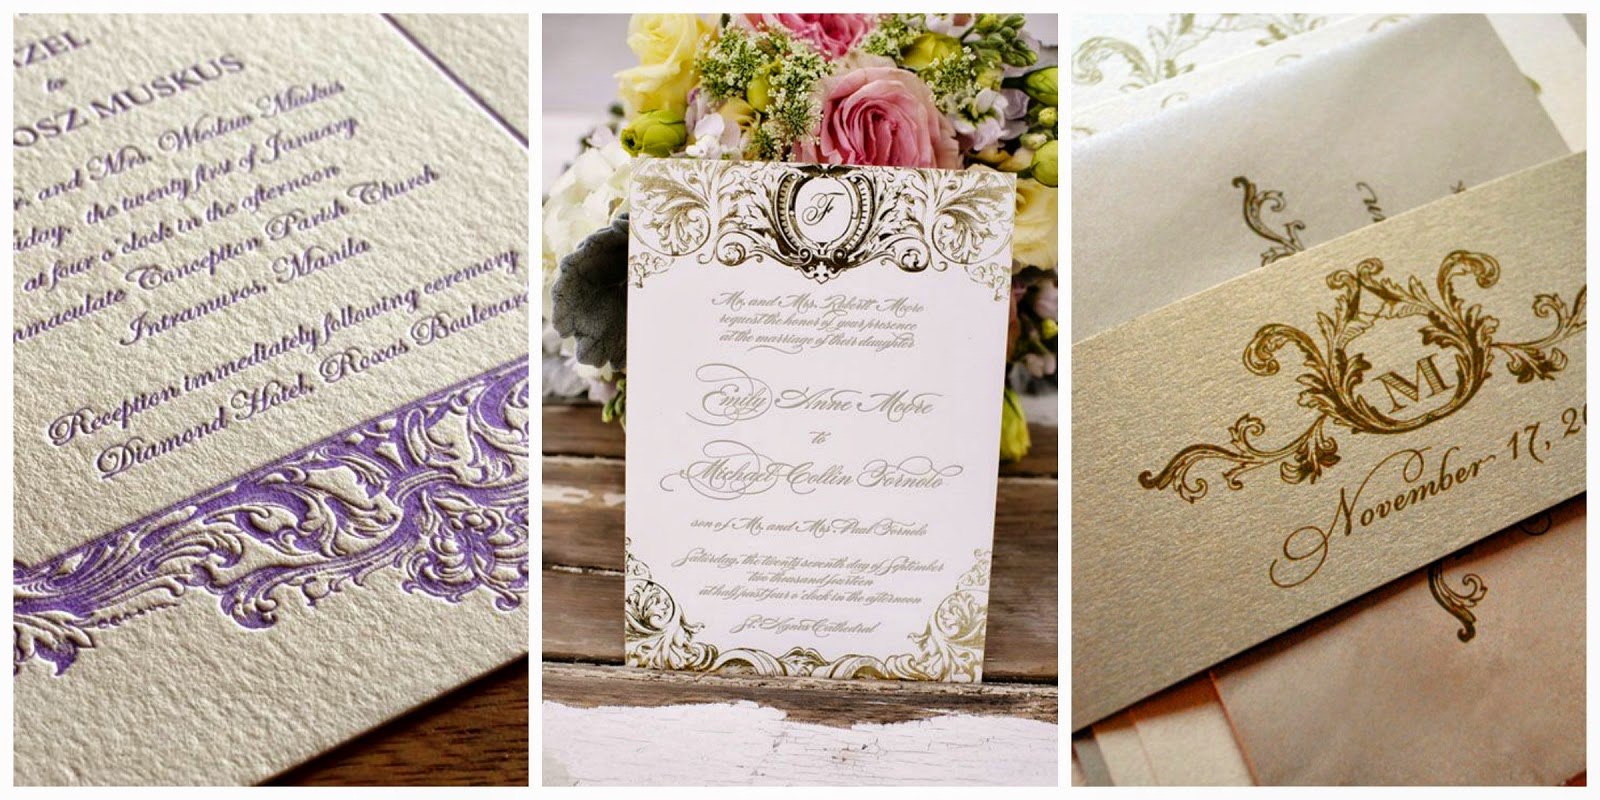 invitacion de boda barroca blog bodas mi boda gratis